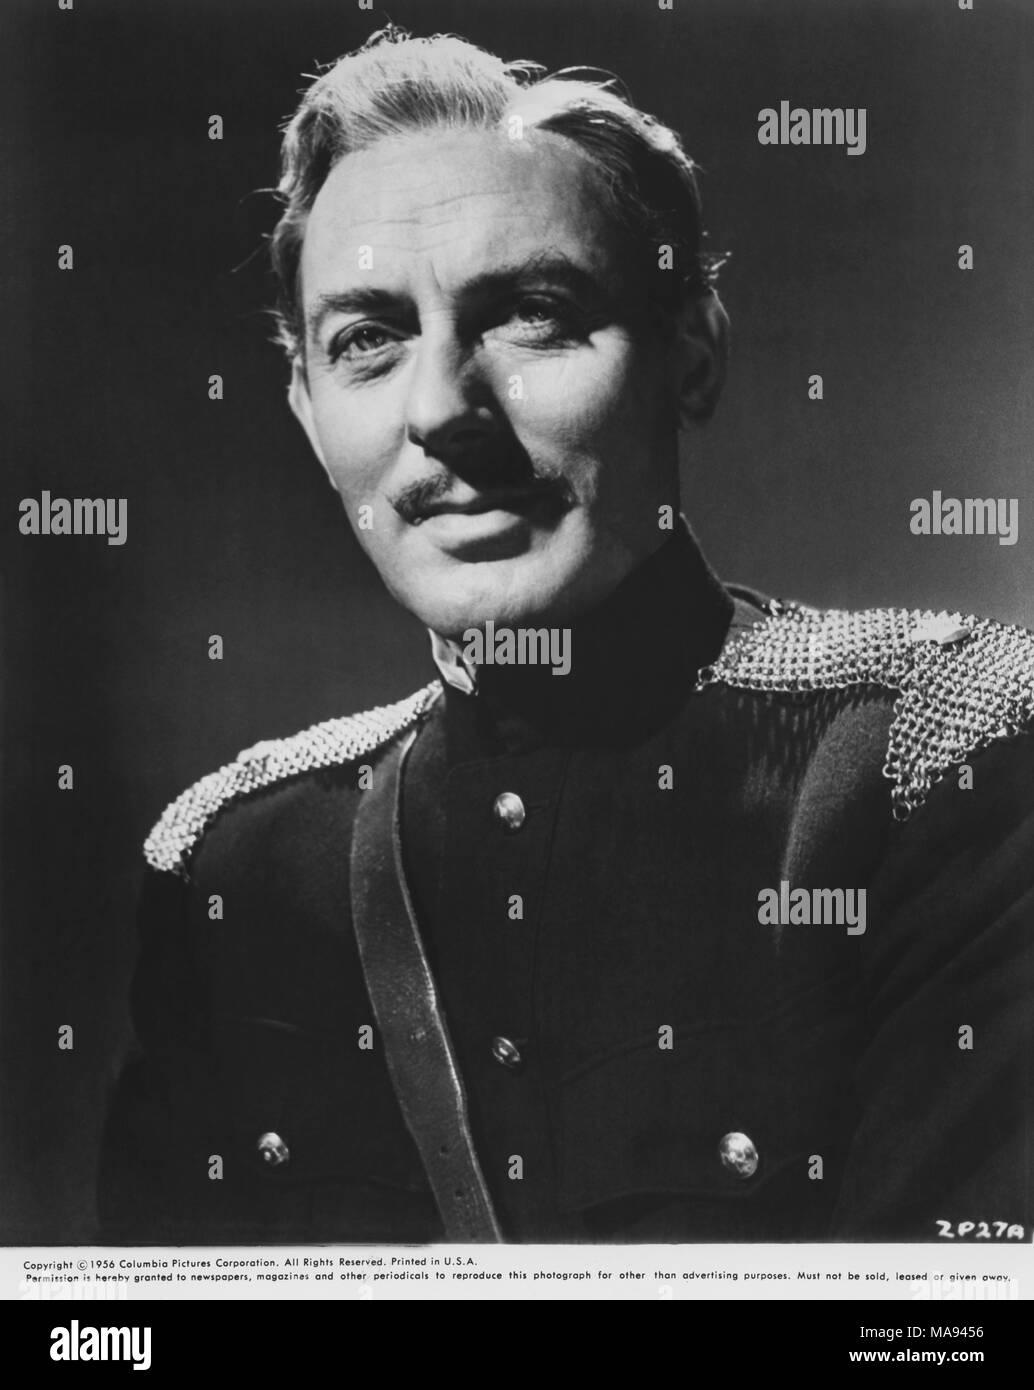 "Michael Wilding, Werbung, Portrait, der britische Film ""Zarak"", Columbia Pictures, 1956, Film Release Datum, 10. Januar 1957 Stockbild"